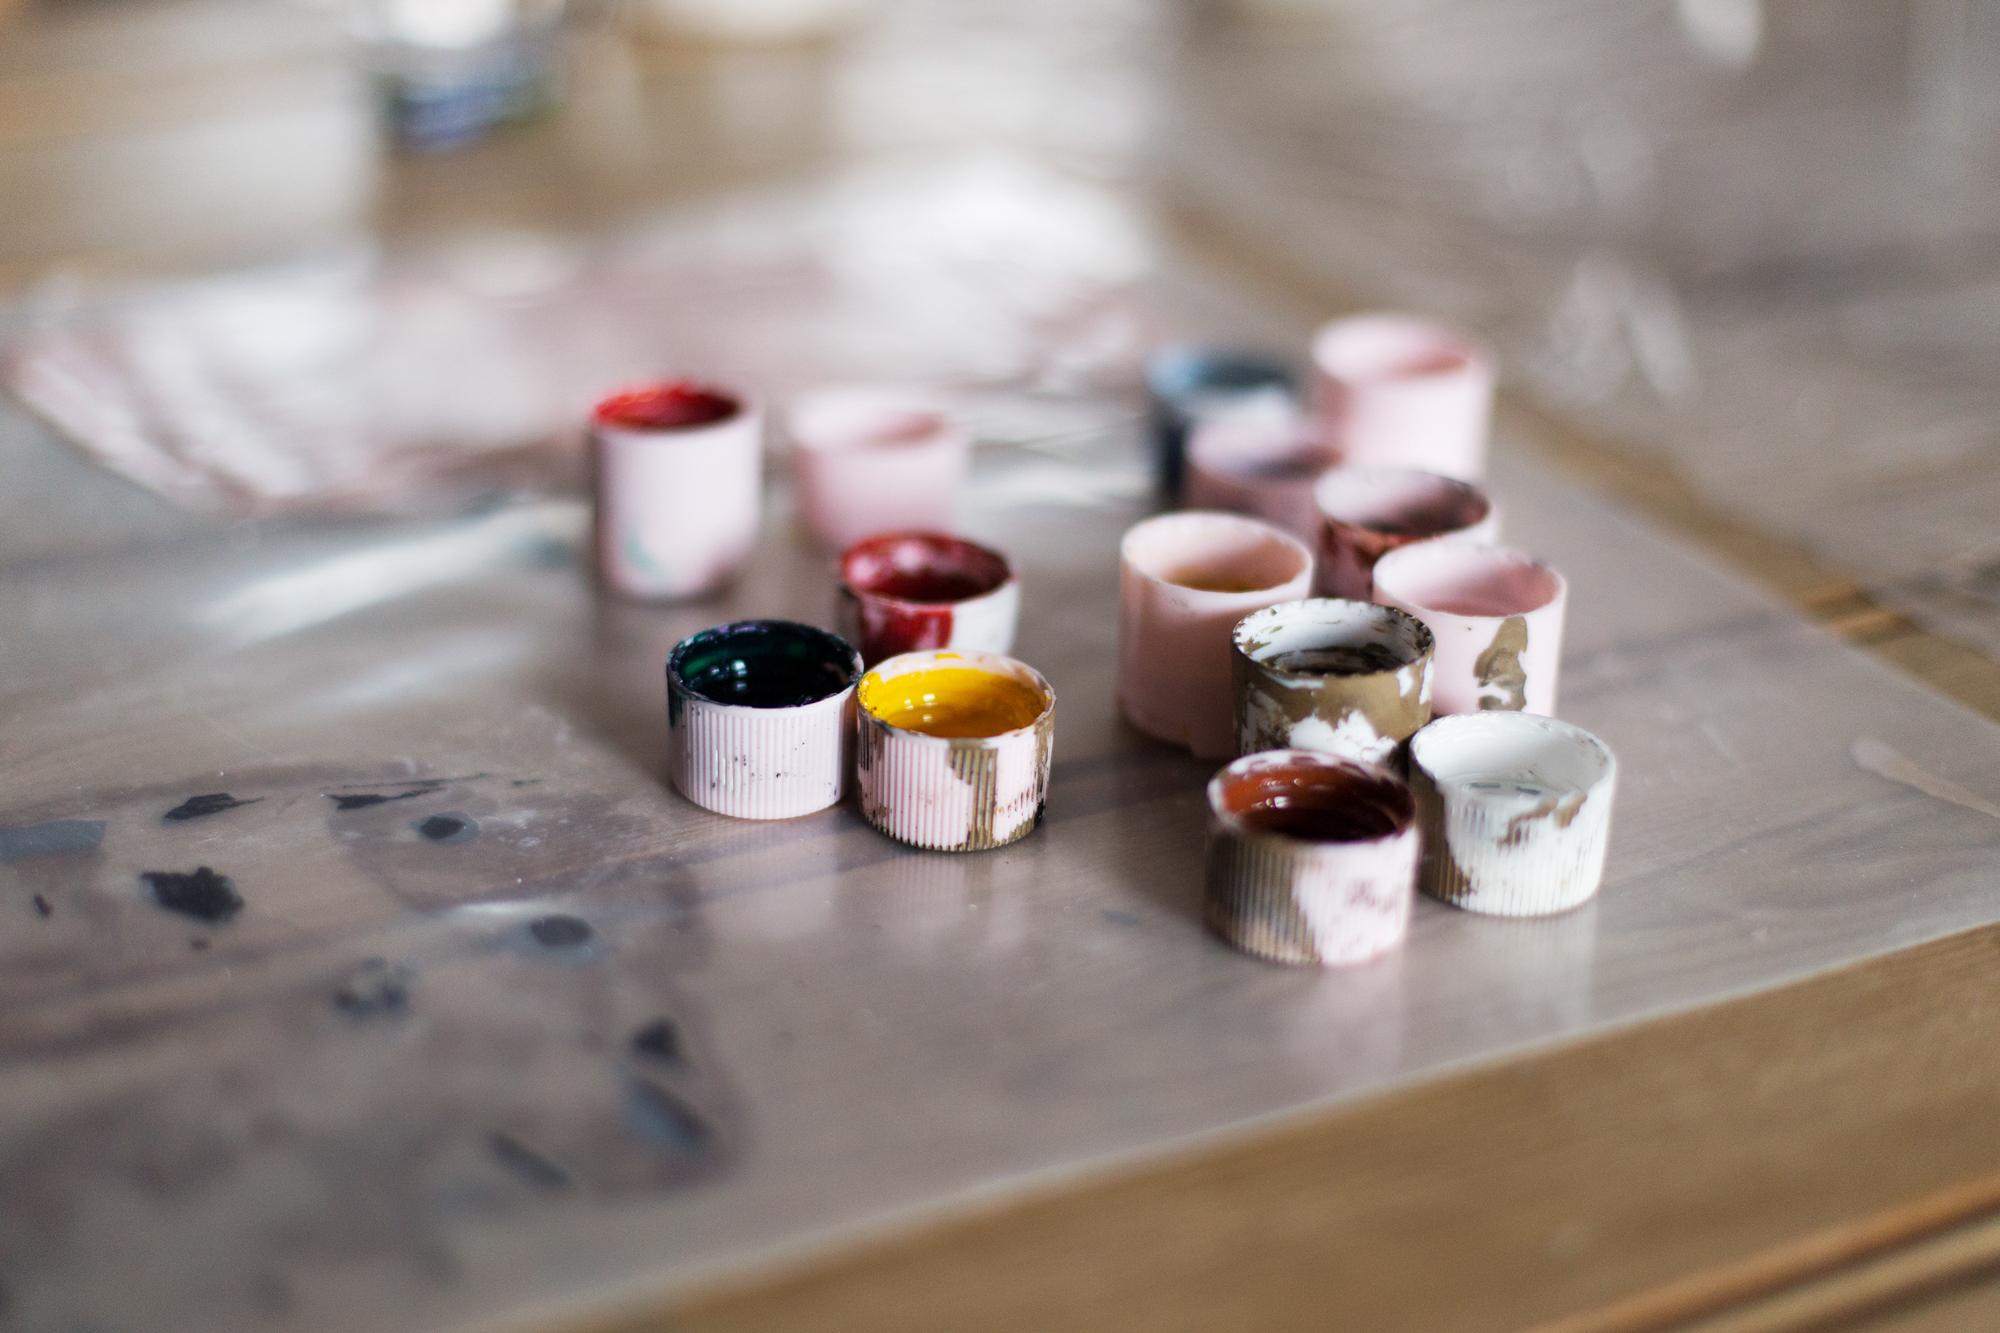 Jesmonite Terrazzo tile workshop with Katie Gilles, Modern art and craft classes in Bristol